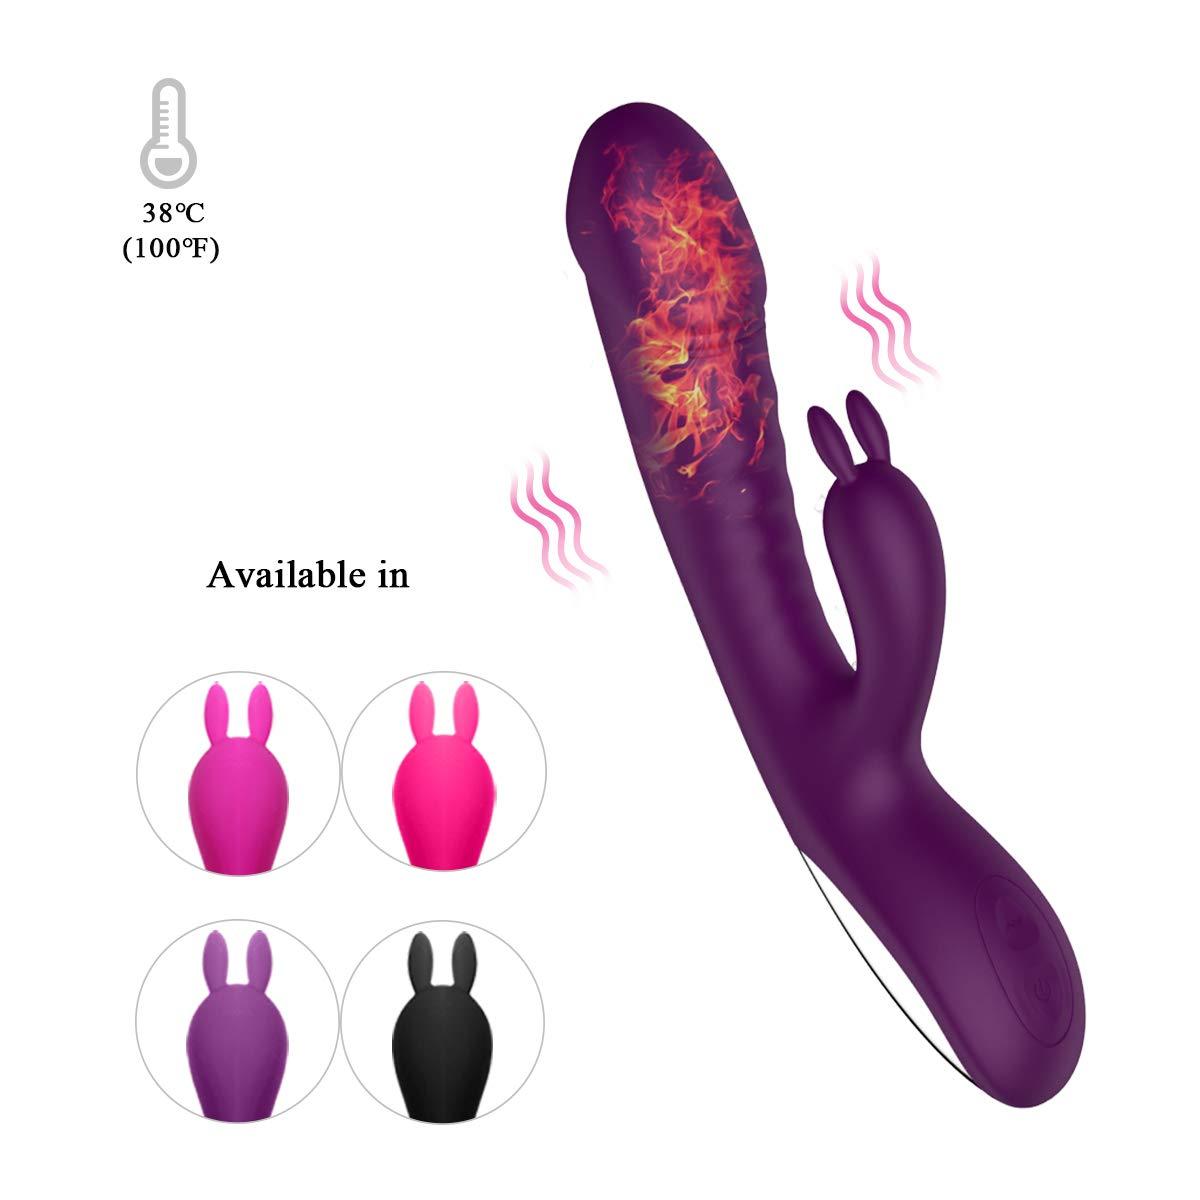 Vibrating Dildo 10 Modes, Rabbit Vibrator with Bunny Ears for Clitoris G-Spot Stimulation Dual Motors Internal Heating 38℃-40℃ Sex Toys for Women Couple-Purple